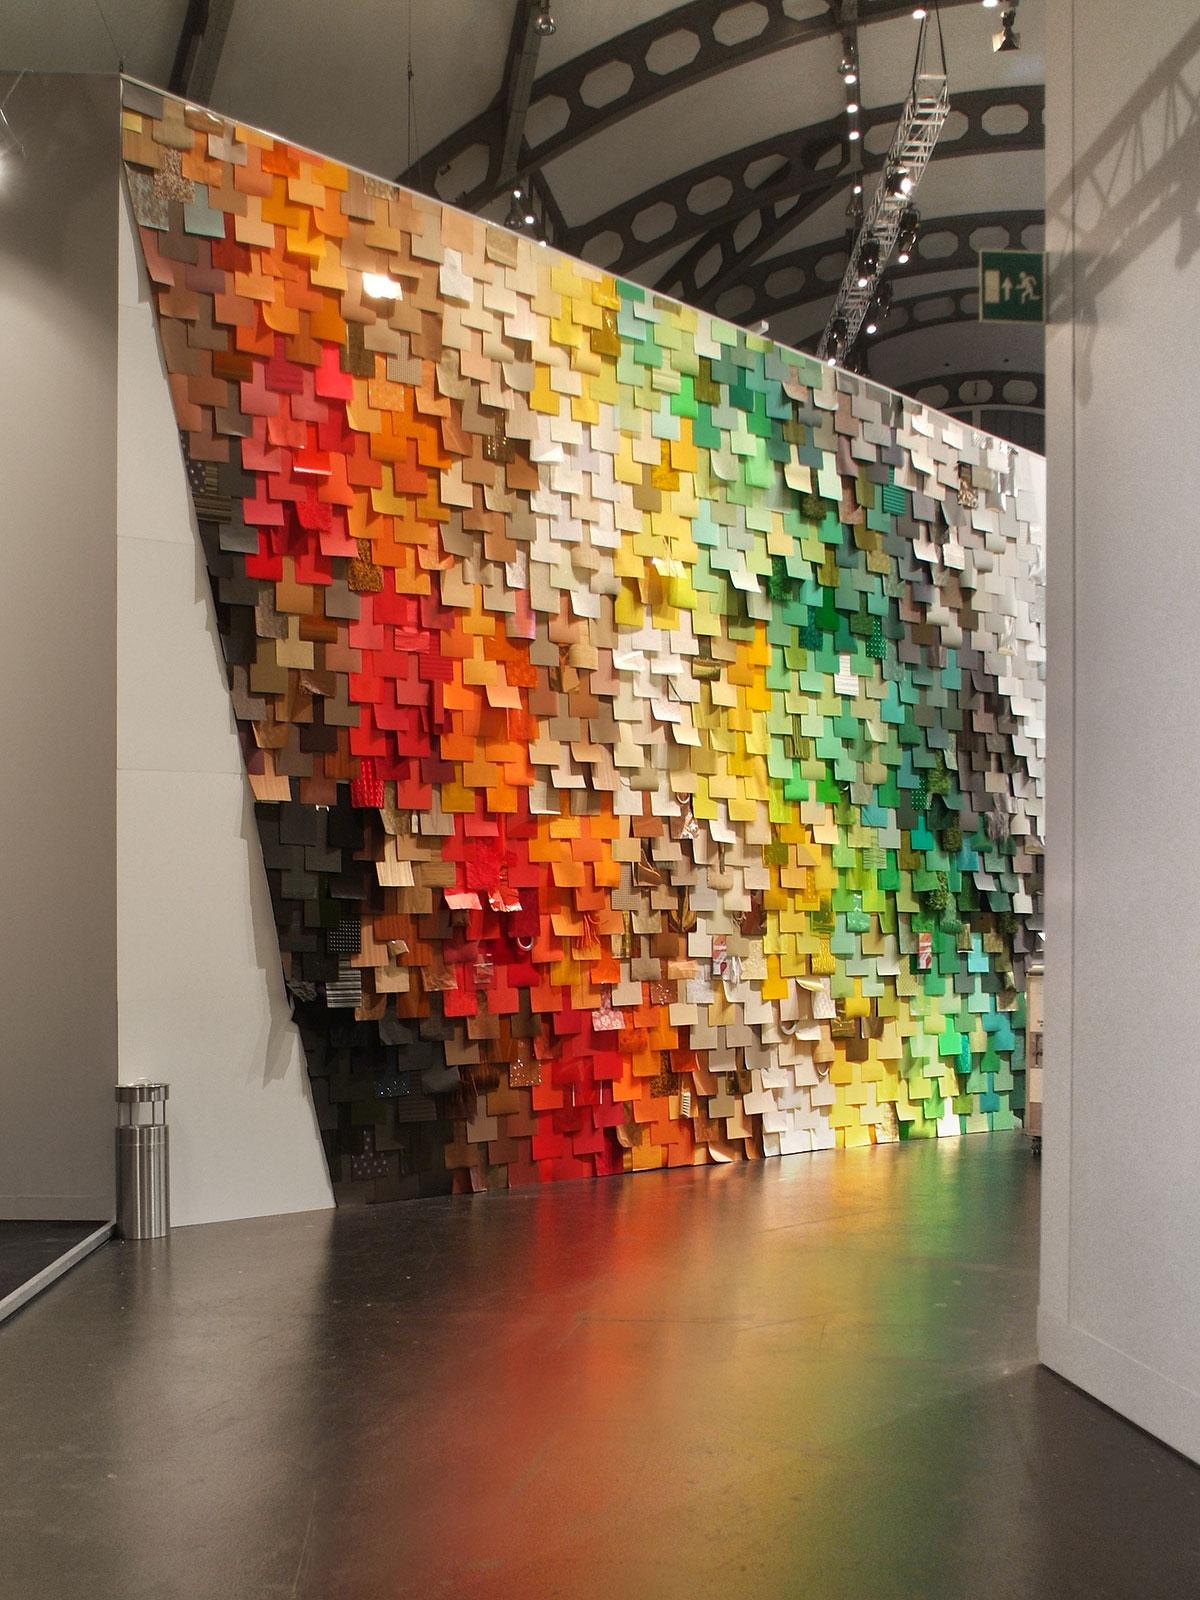 Modulor-material-total-messe-detail-wand-bunt-color-kreative-berlin-shop